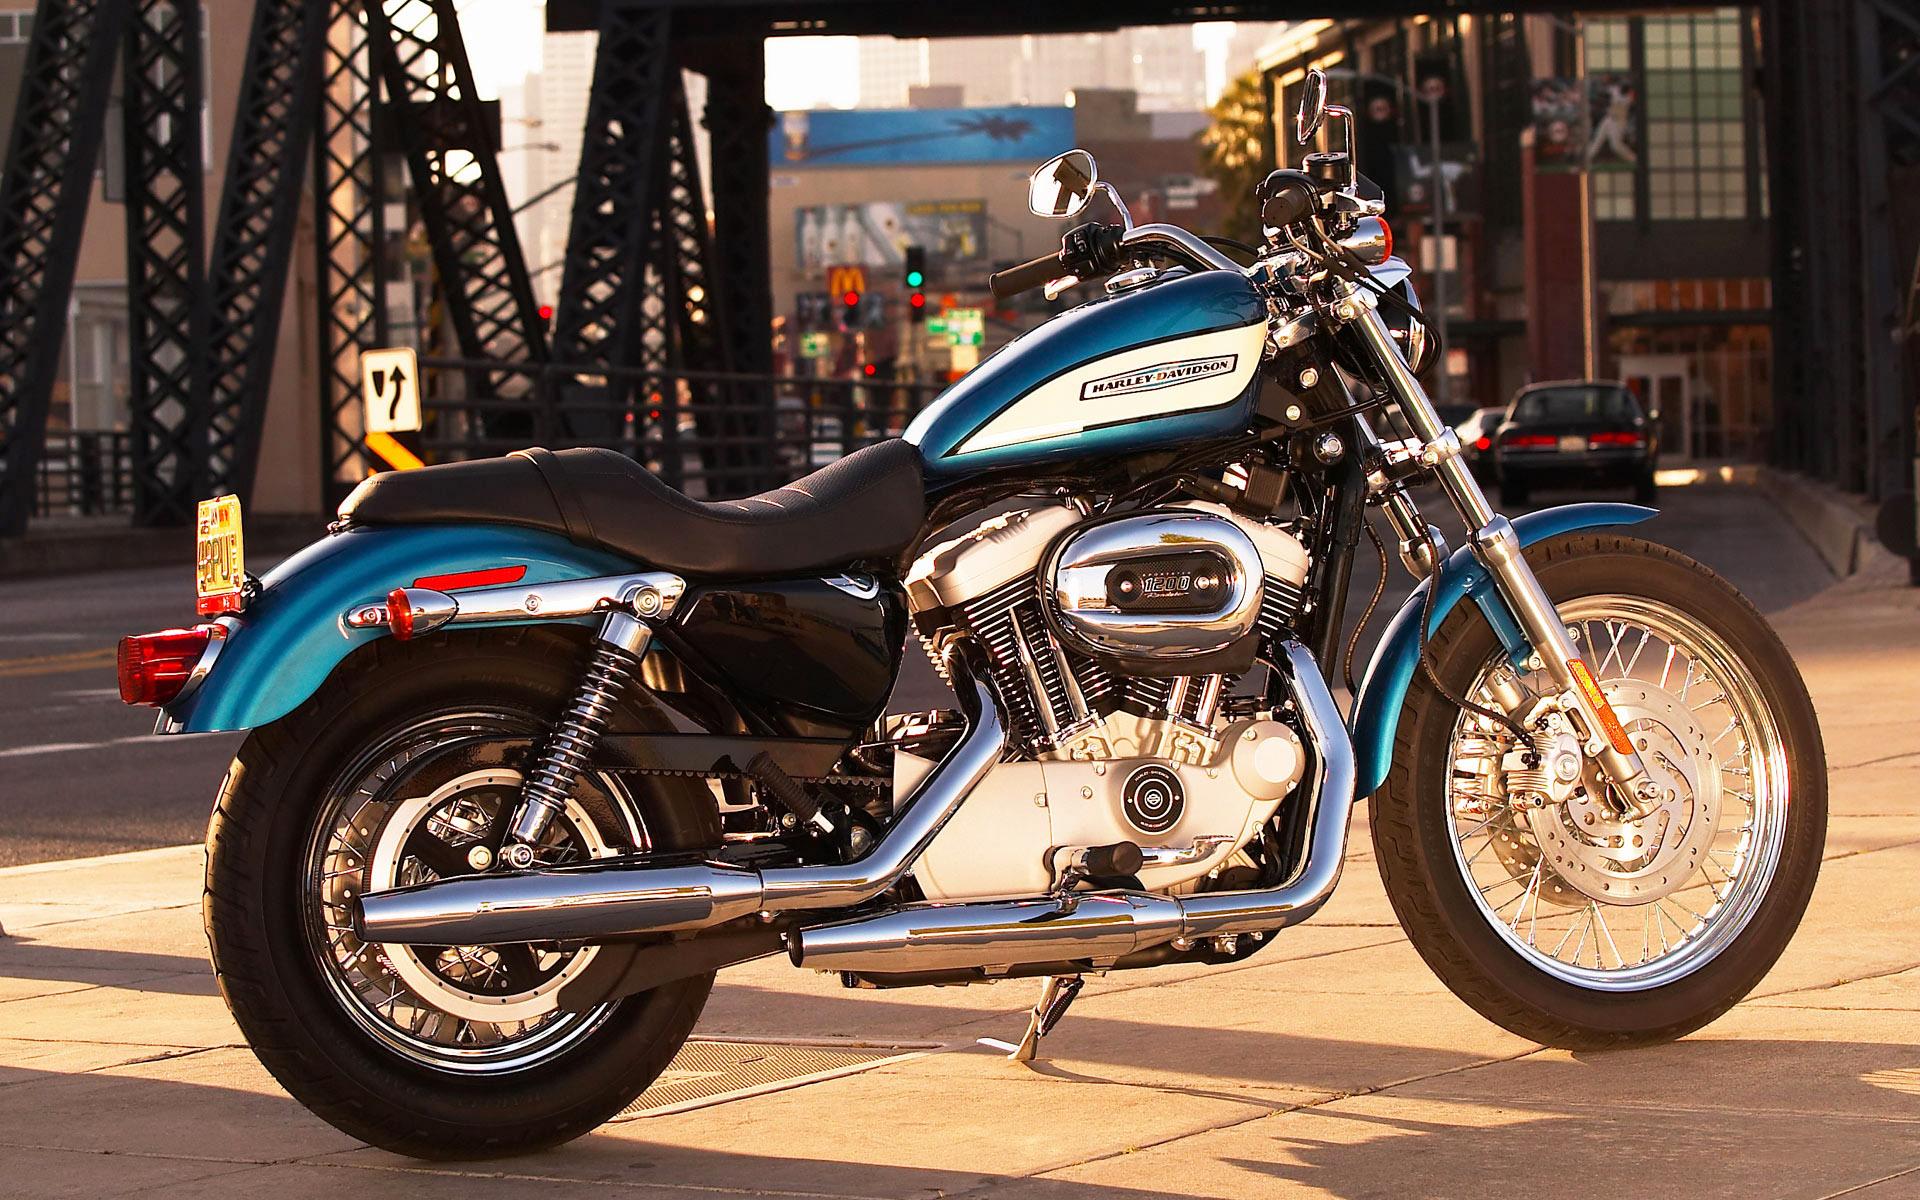 Harley Davidson HD wallpaper 1920 x 1200 pictures 40jpg Harley 30jpg 1920x1200